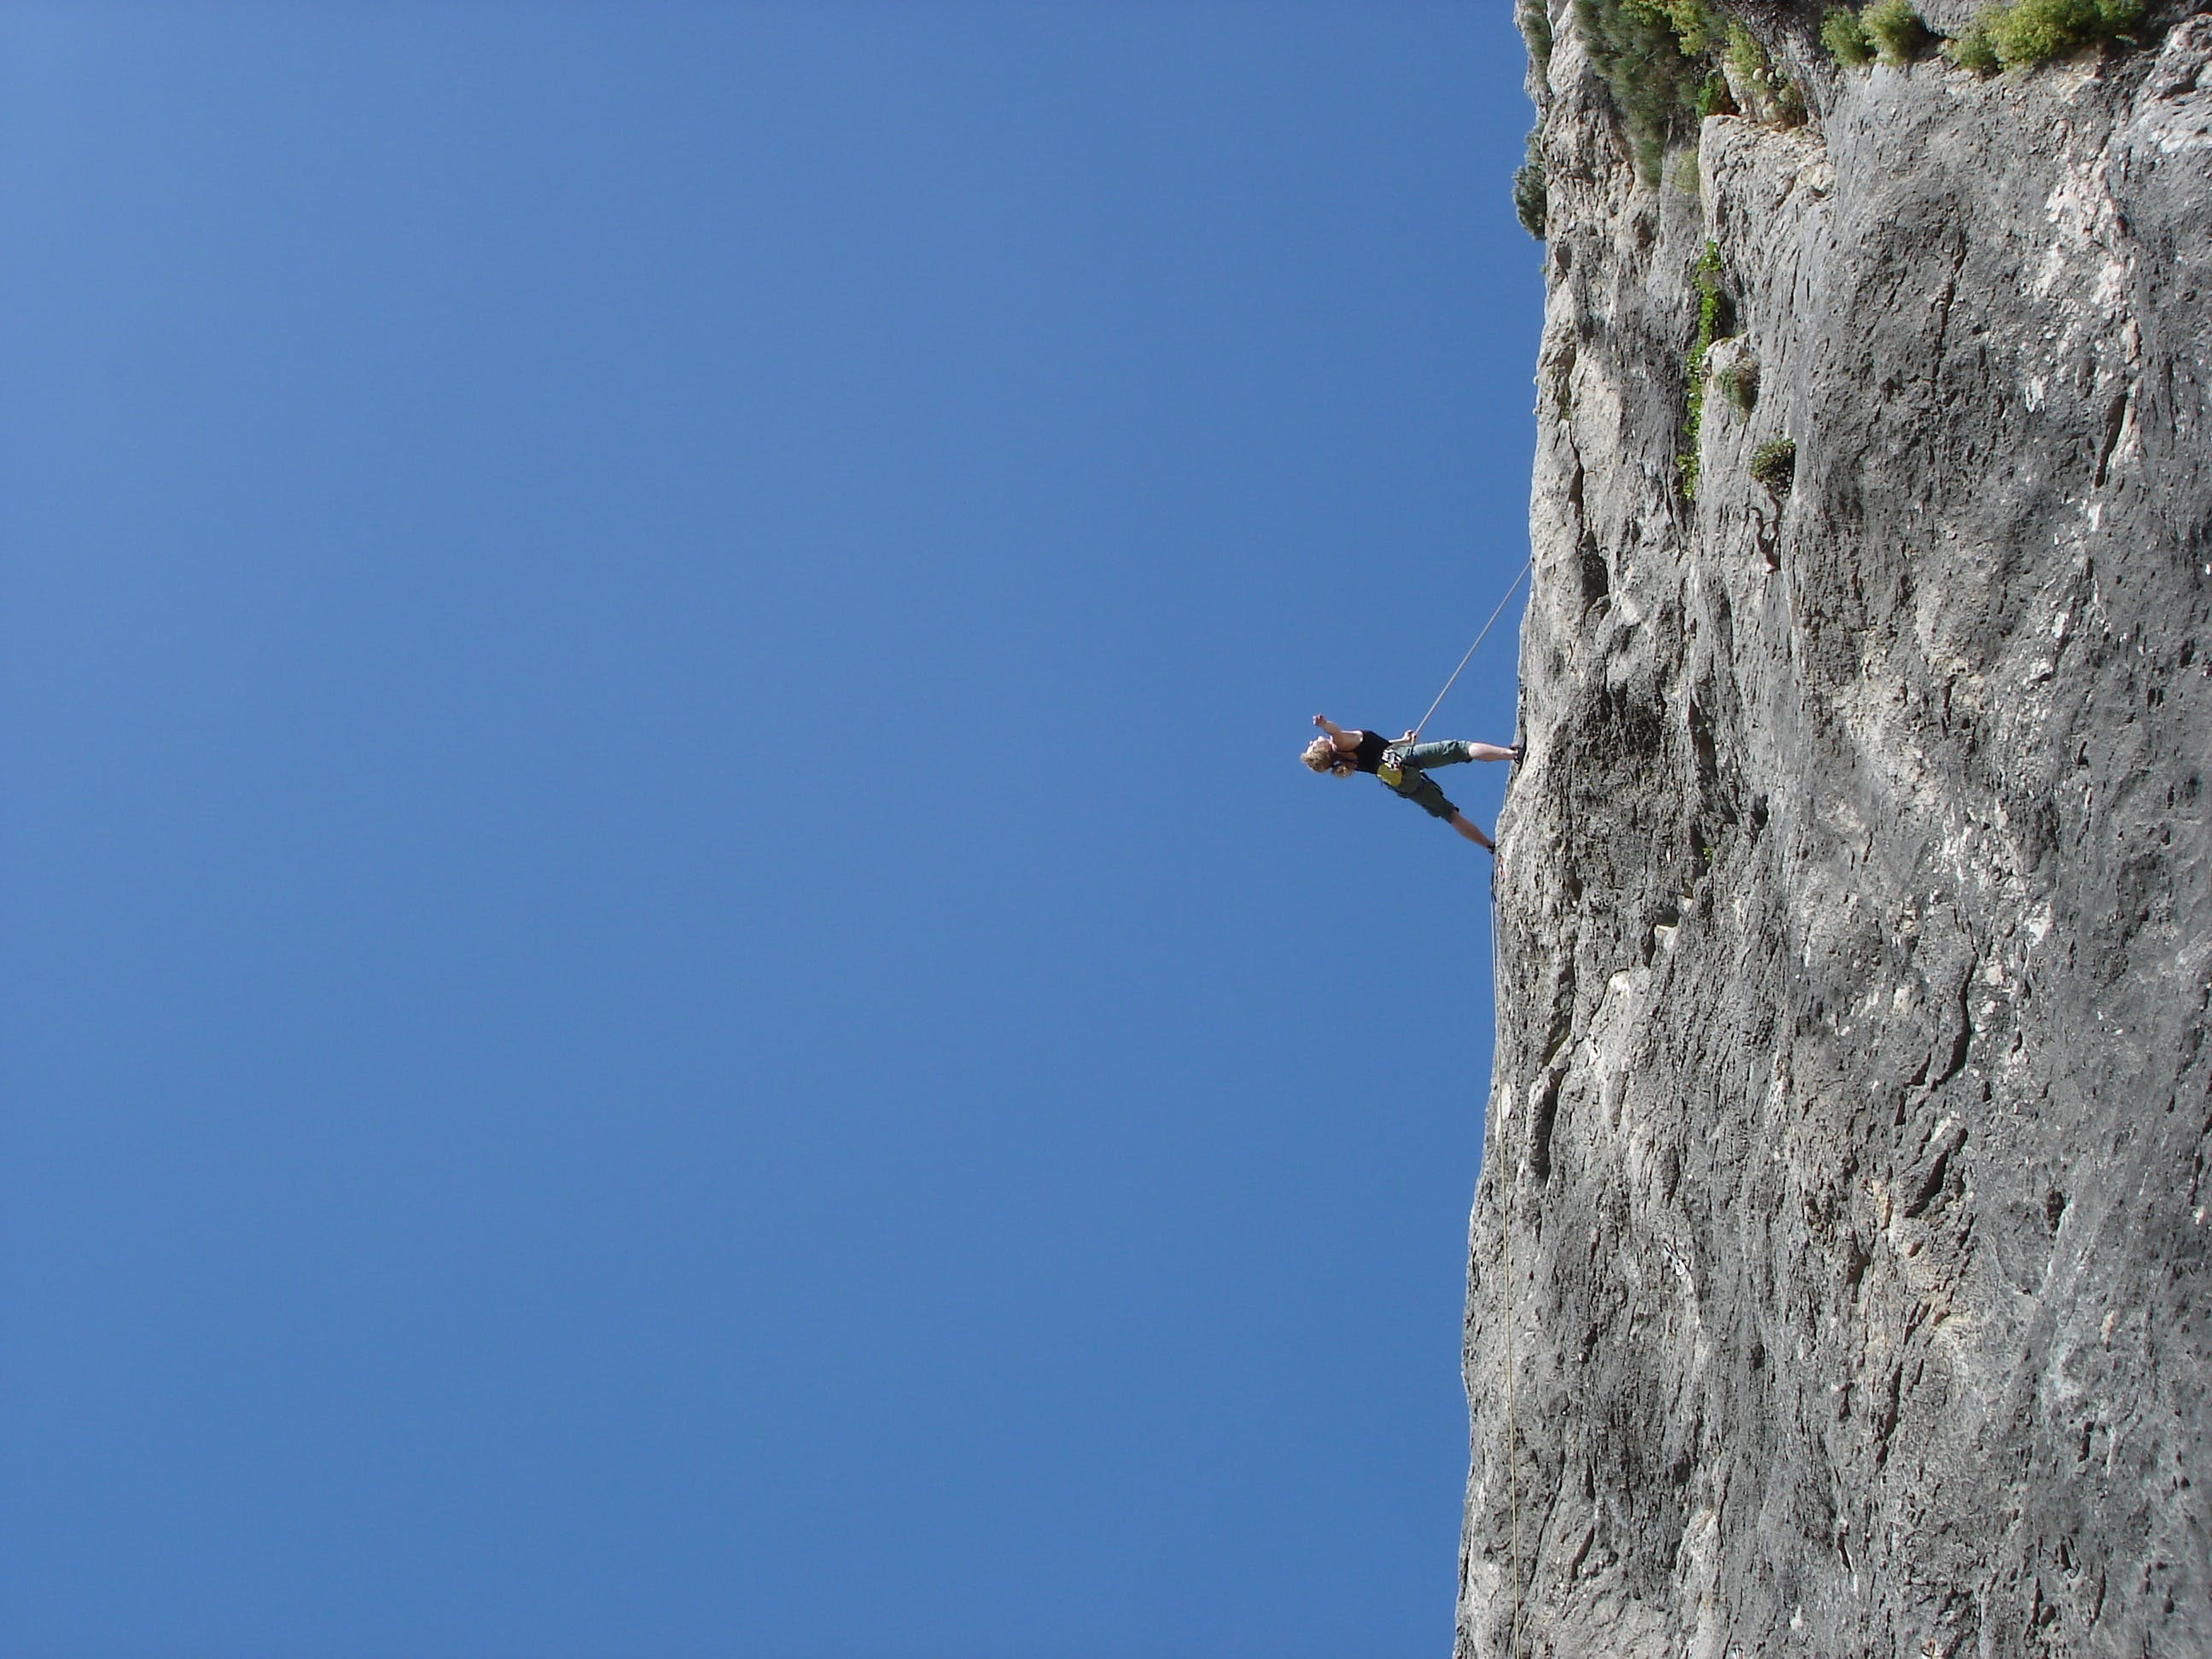 alpinisme, alpinista, aventura